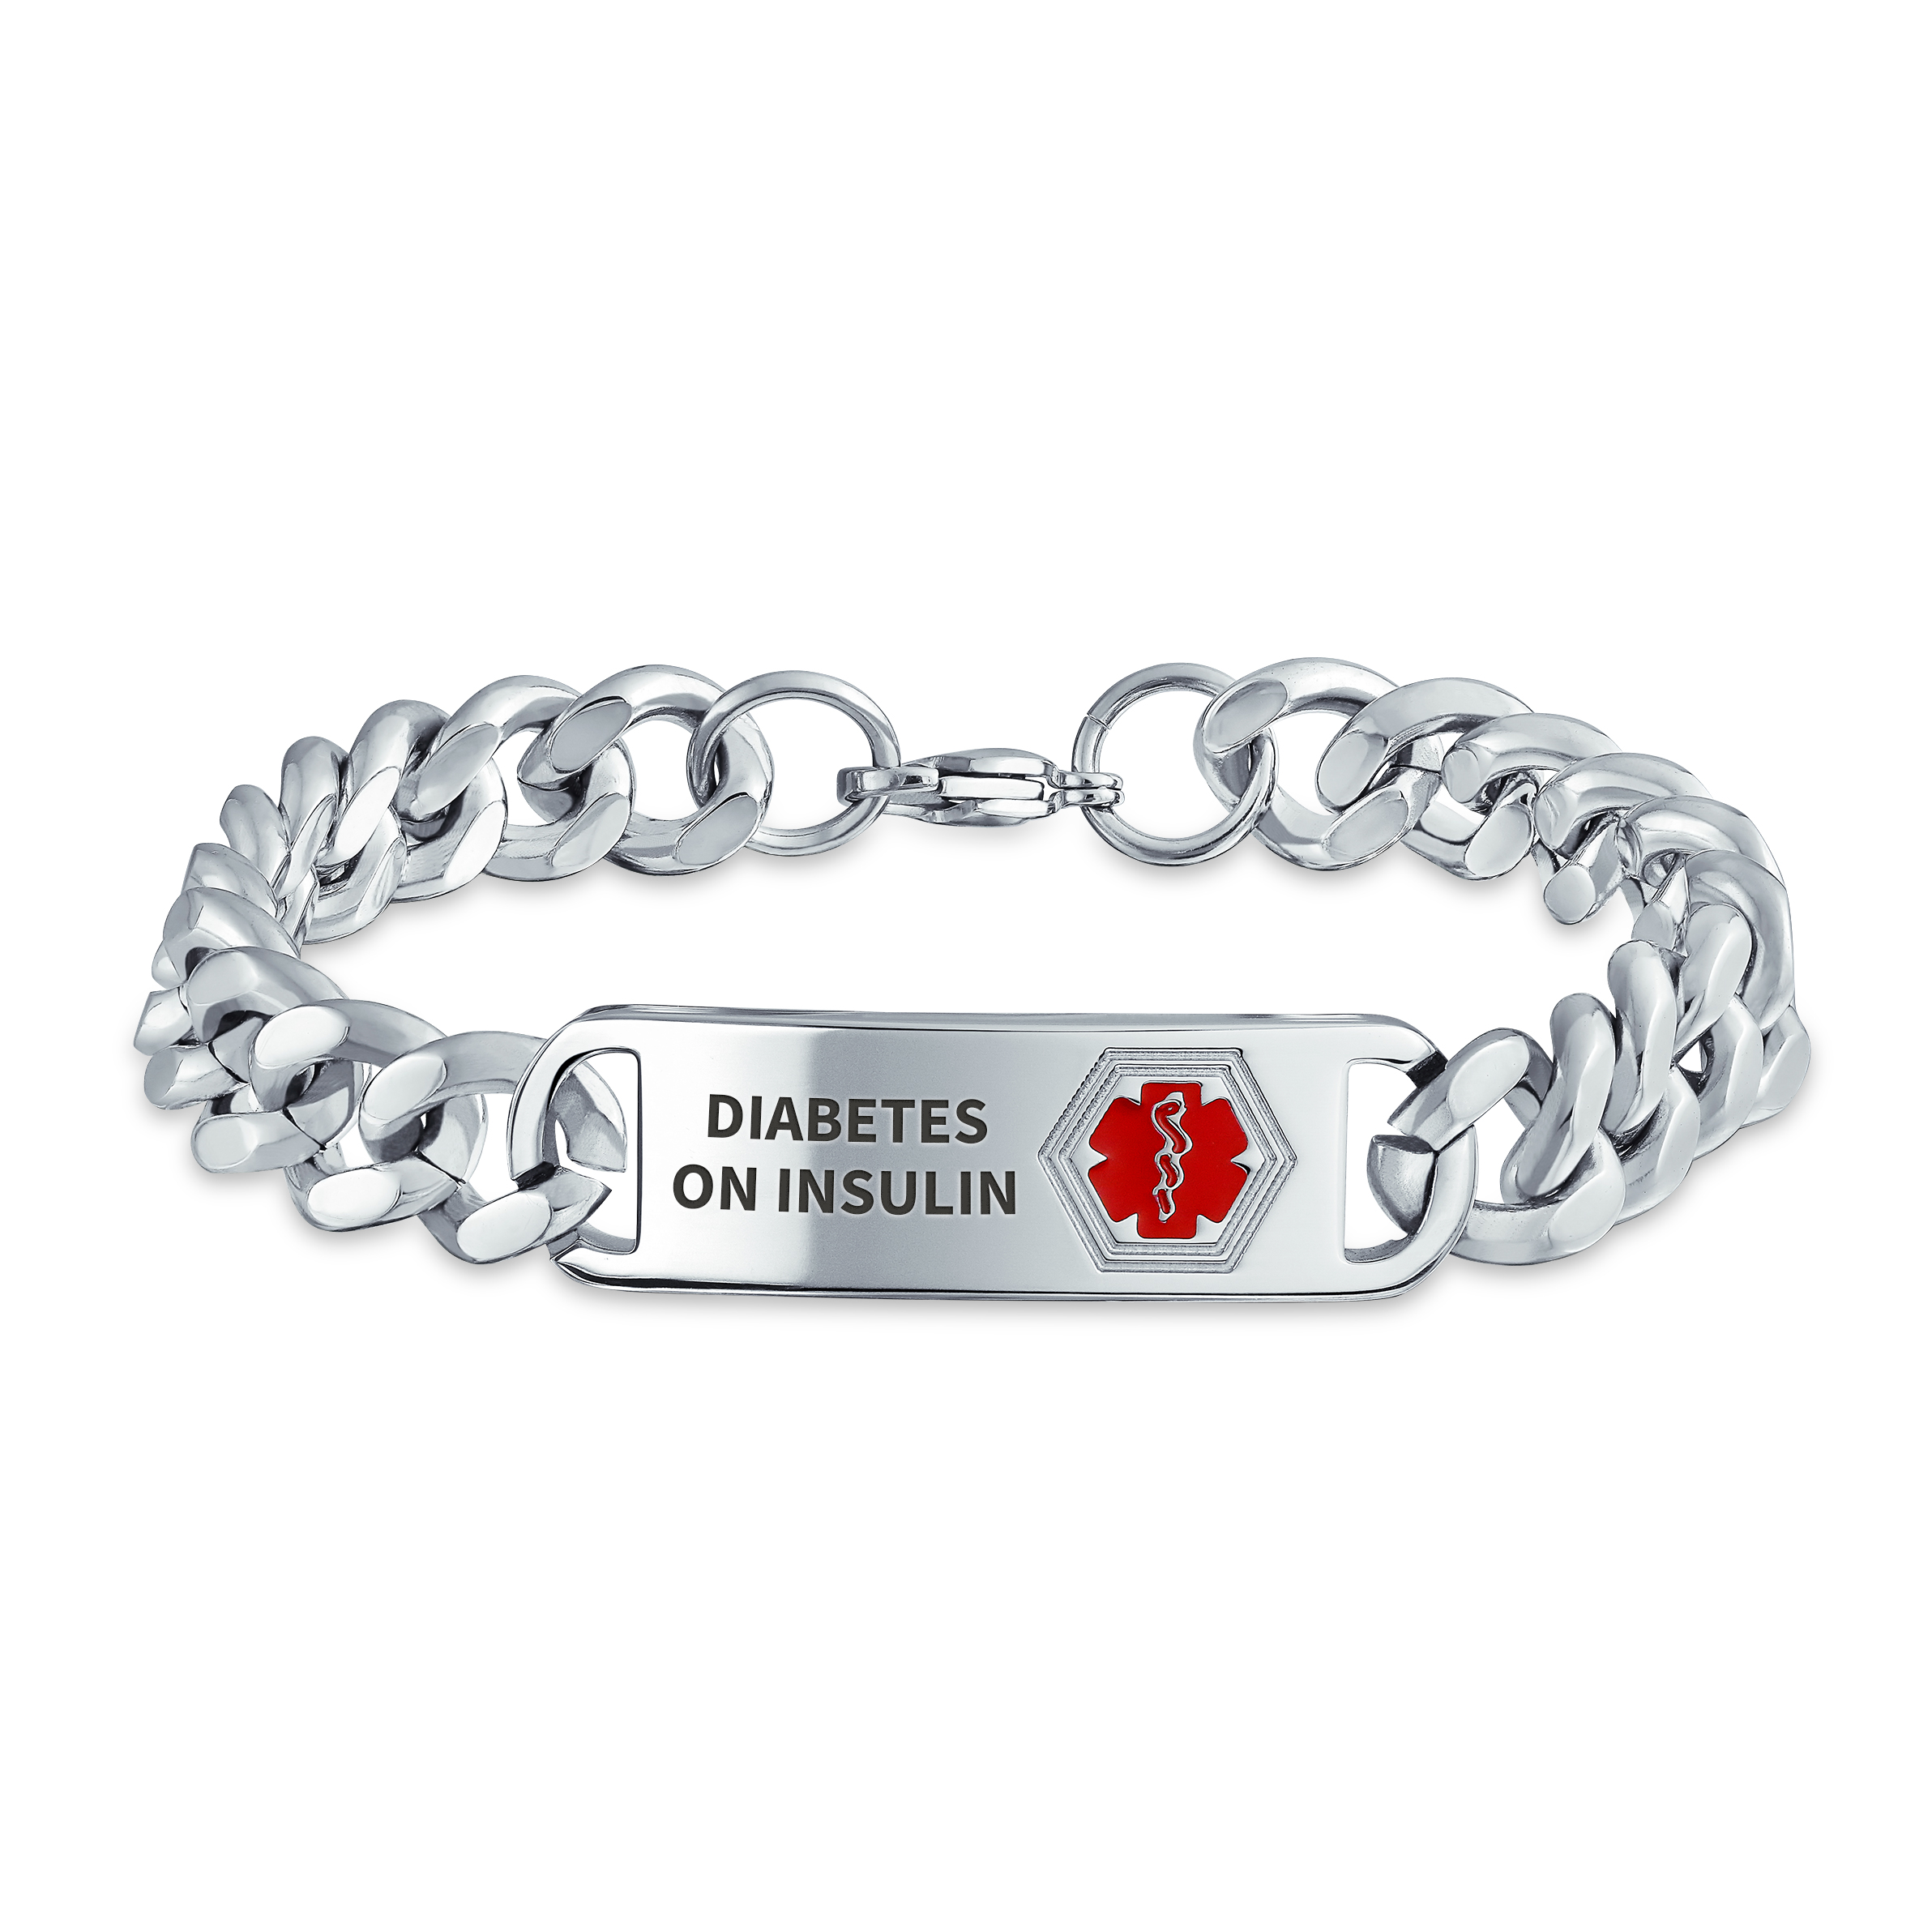 diabetic jewelry sterling silver medical Custom medical alert toggle bracelet medical ID bracelet personalized medical identification